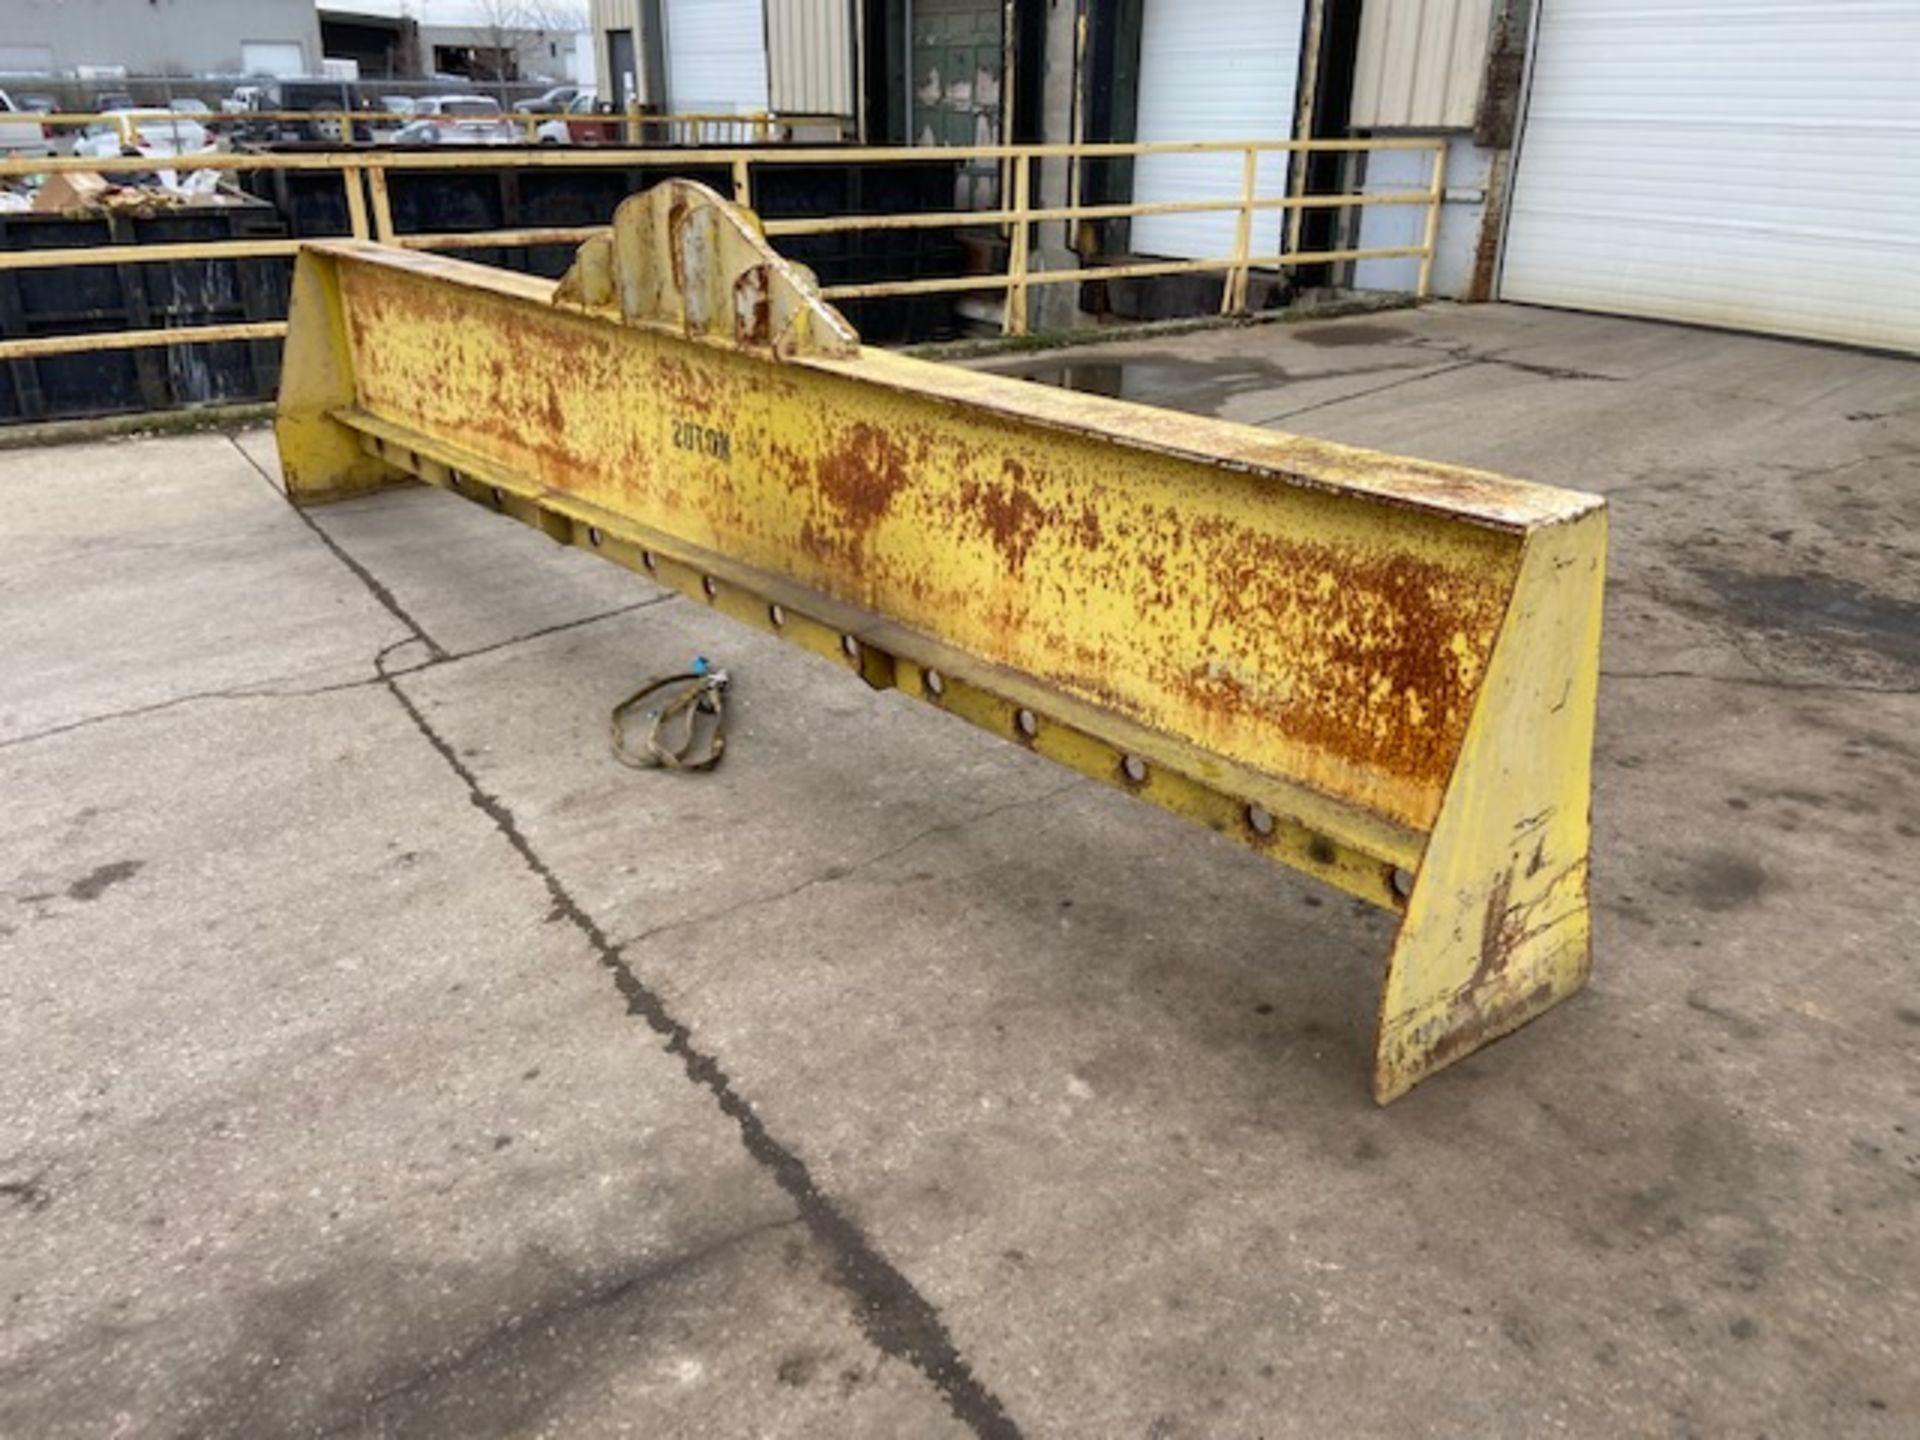 20 Ton Lifting Beam - 15 foot length - Image 2 of 2